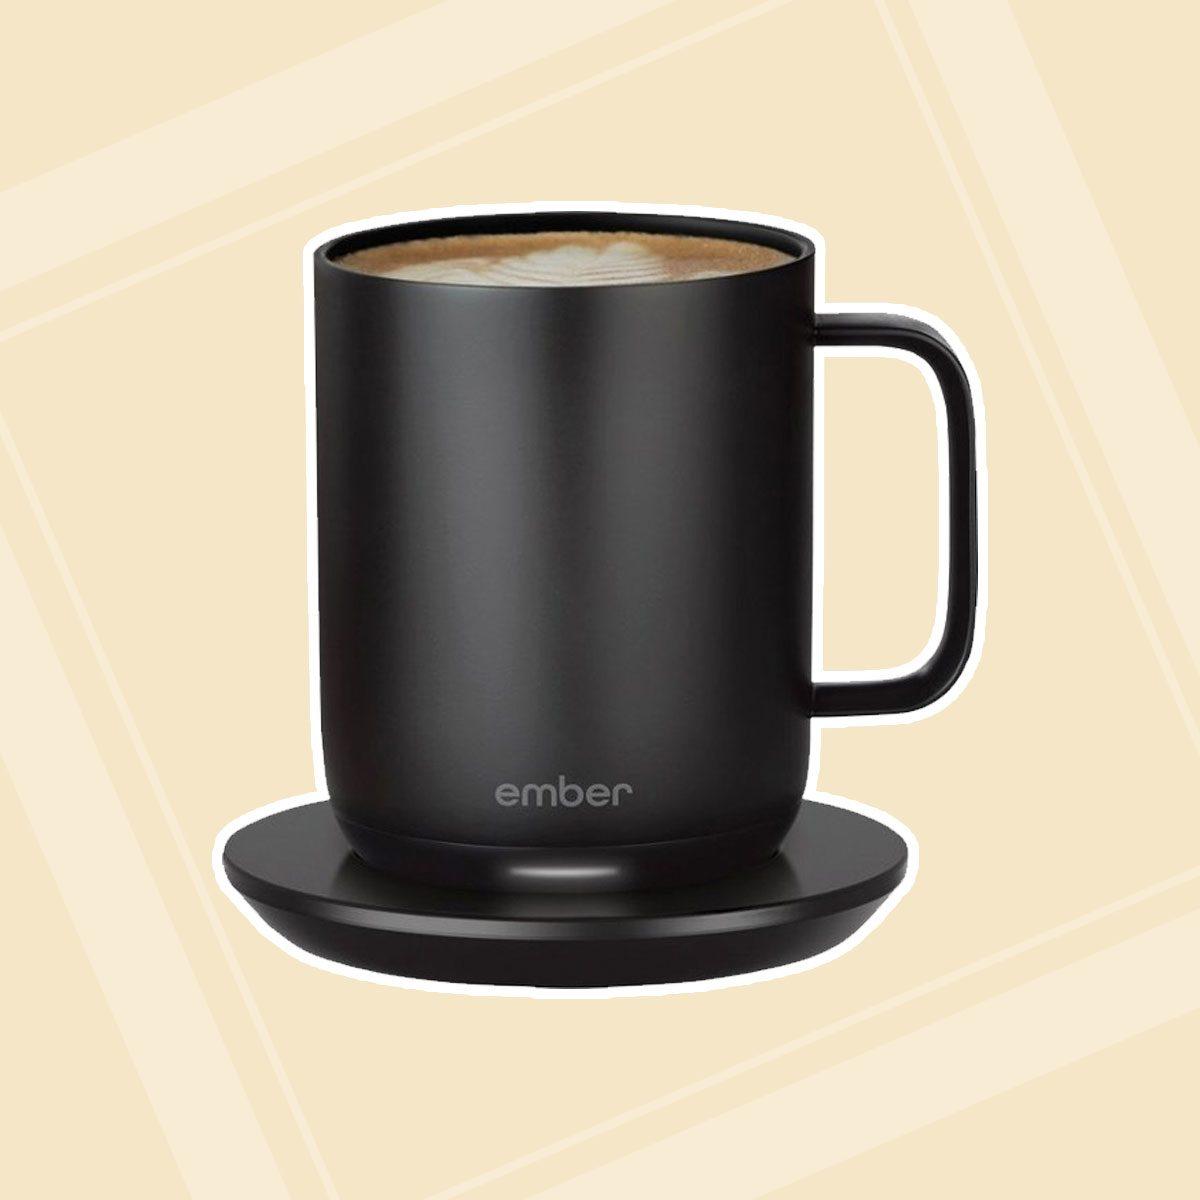 Ember - Temperature Control Smart Mug² - 10 oz - Black